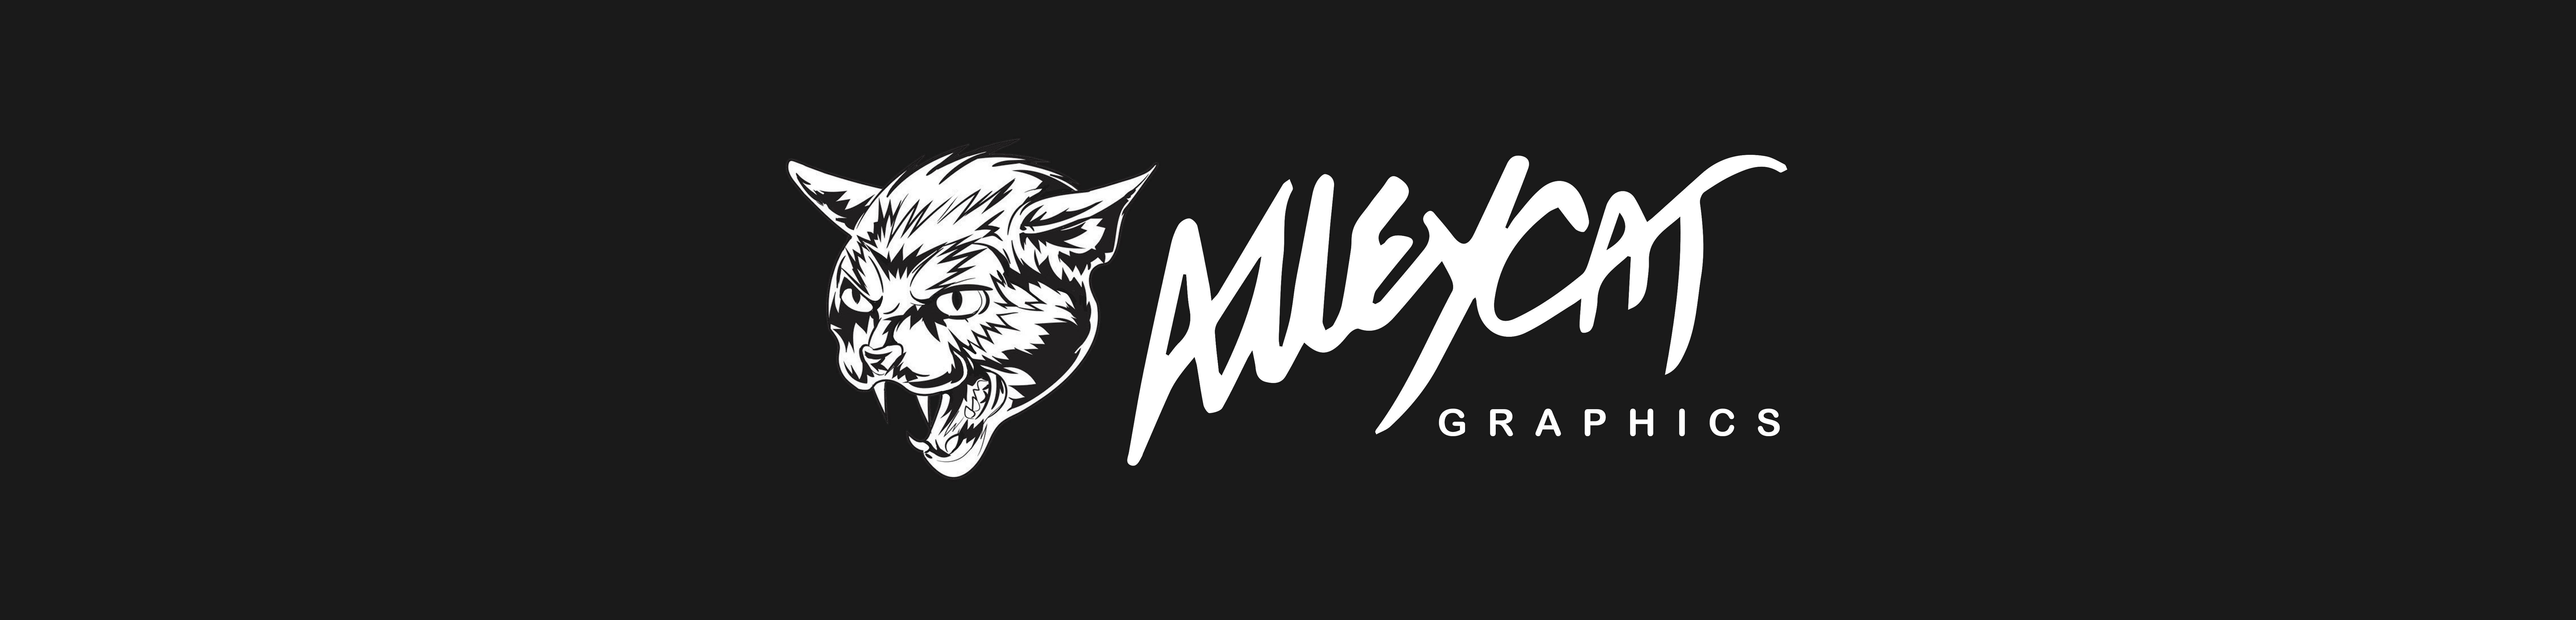 Alleycat Graphics